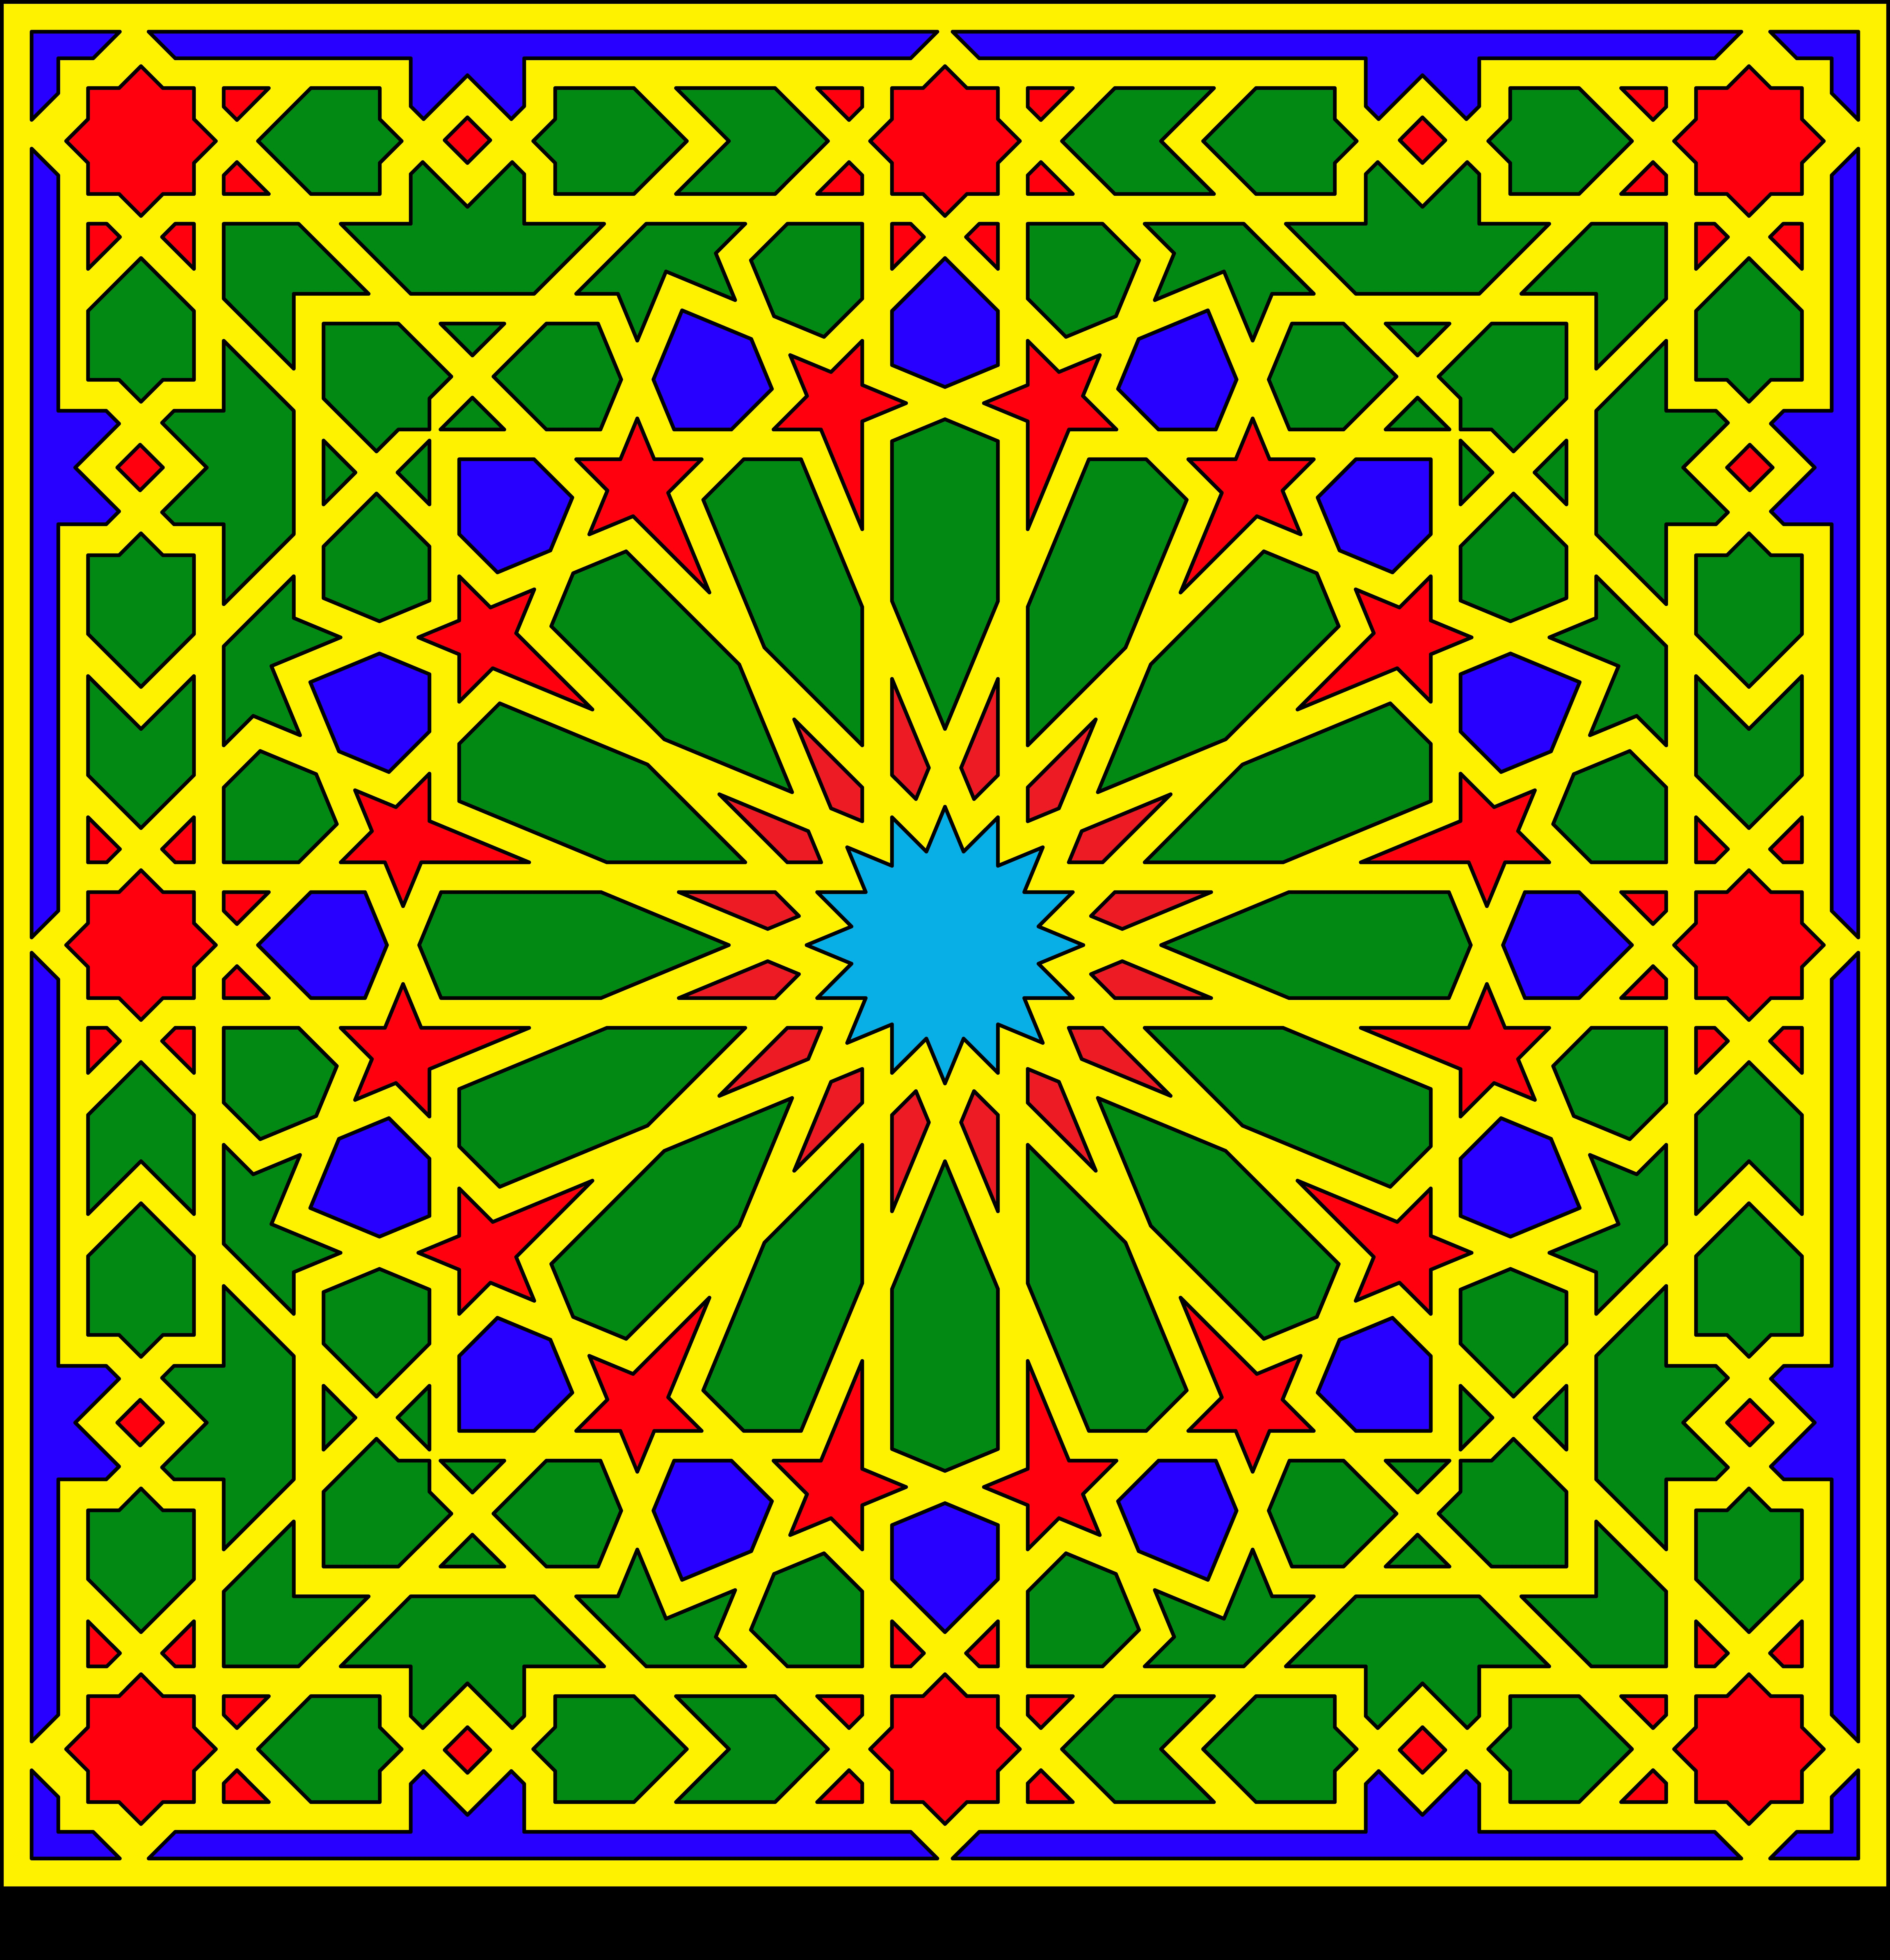 Islamic vector design download free cdr file | CorelDraw Tutorials